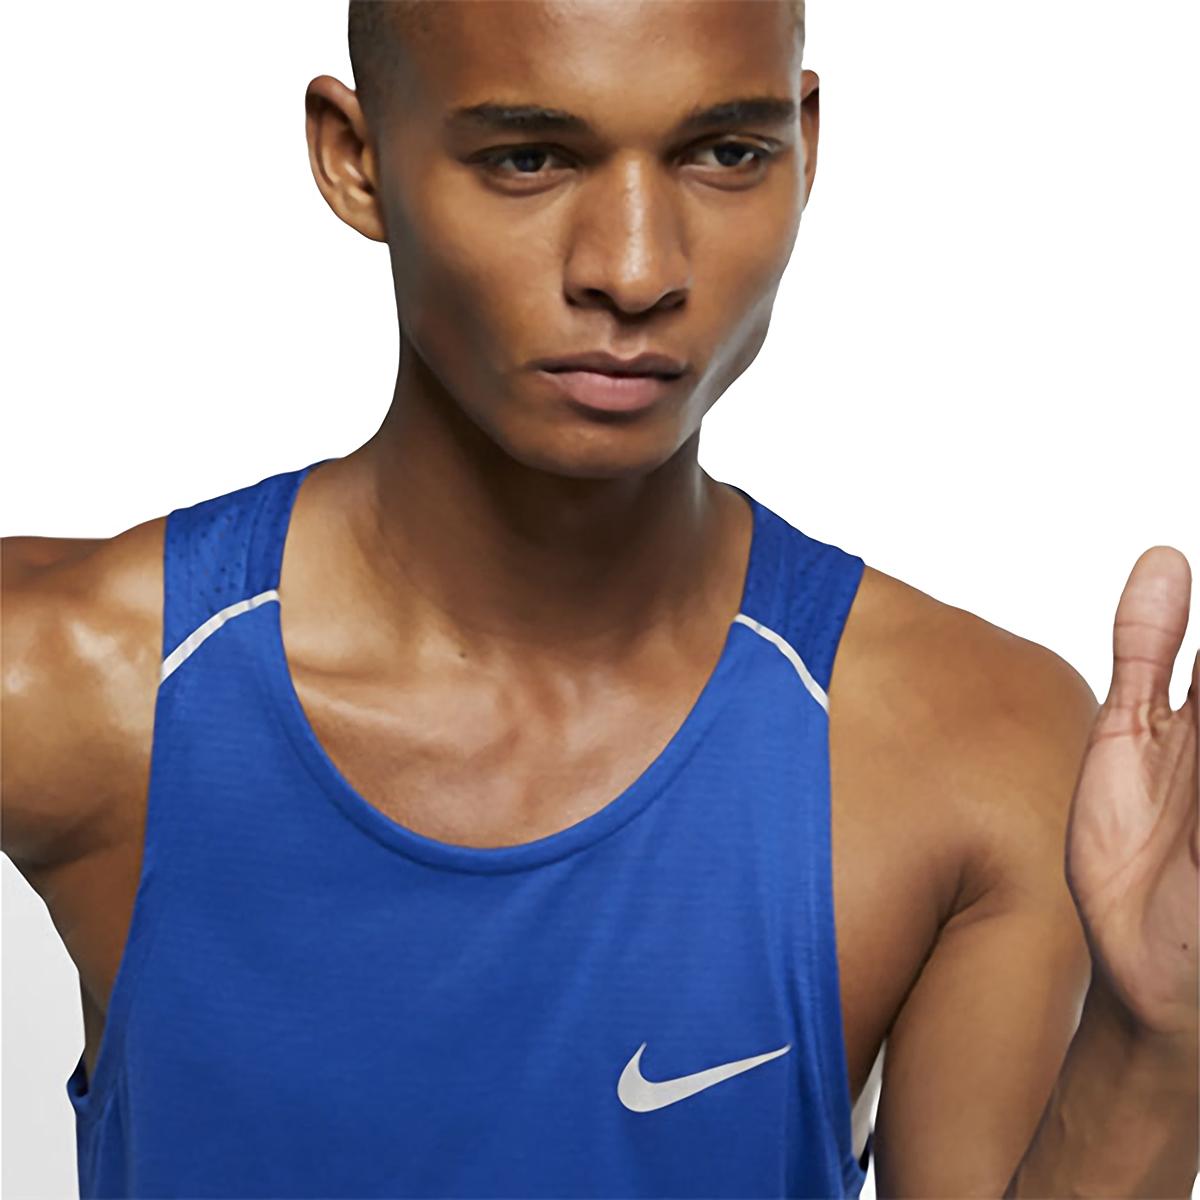 Men's Nike Breathe Rise 365 Tank  - Color: Indigo Force/Reflective  - Size: M, Indigo Force/Reflective, large, image 4